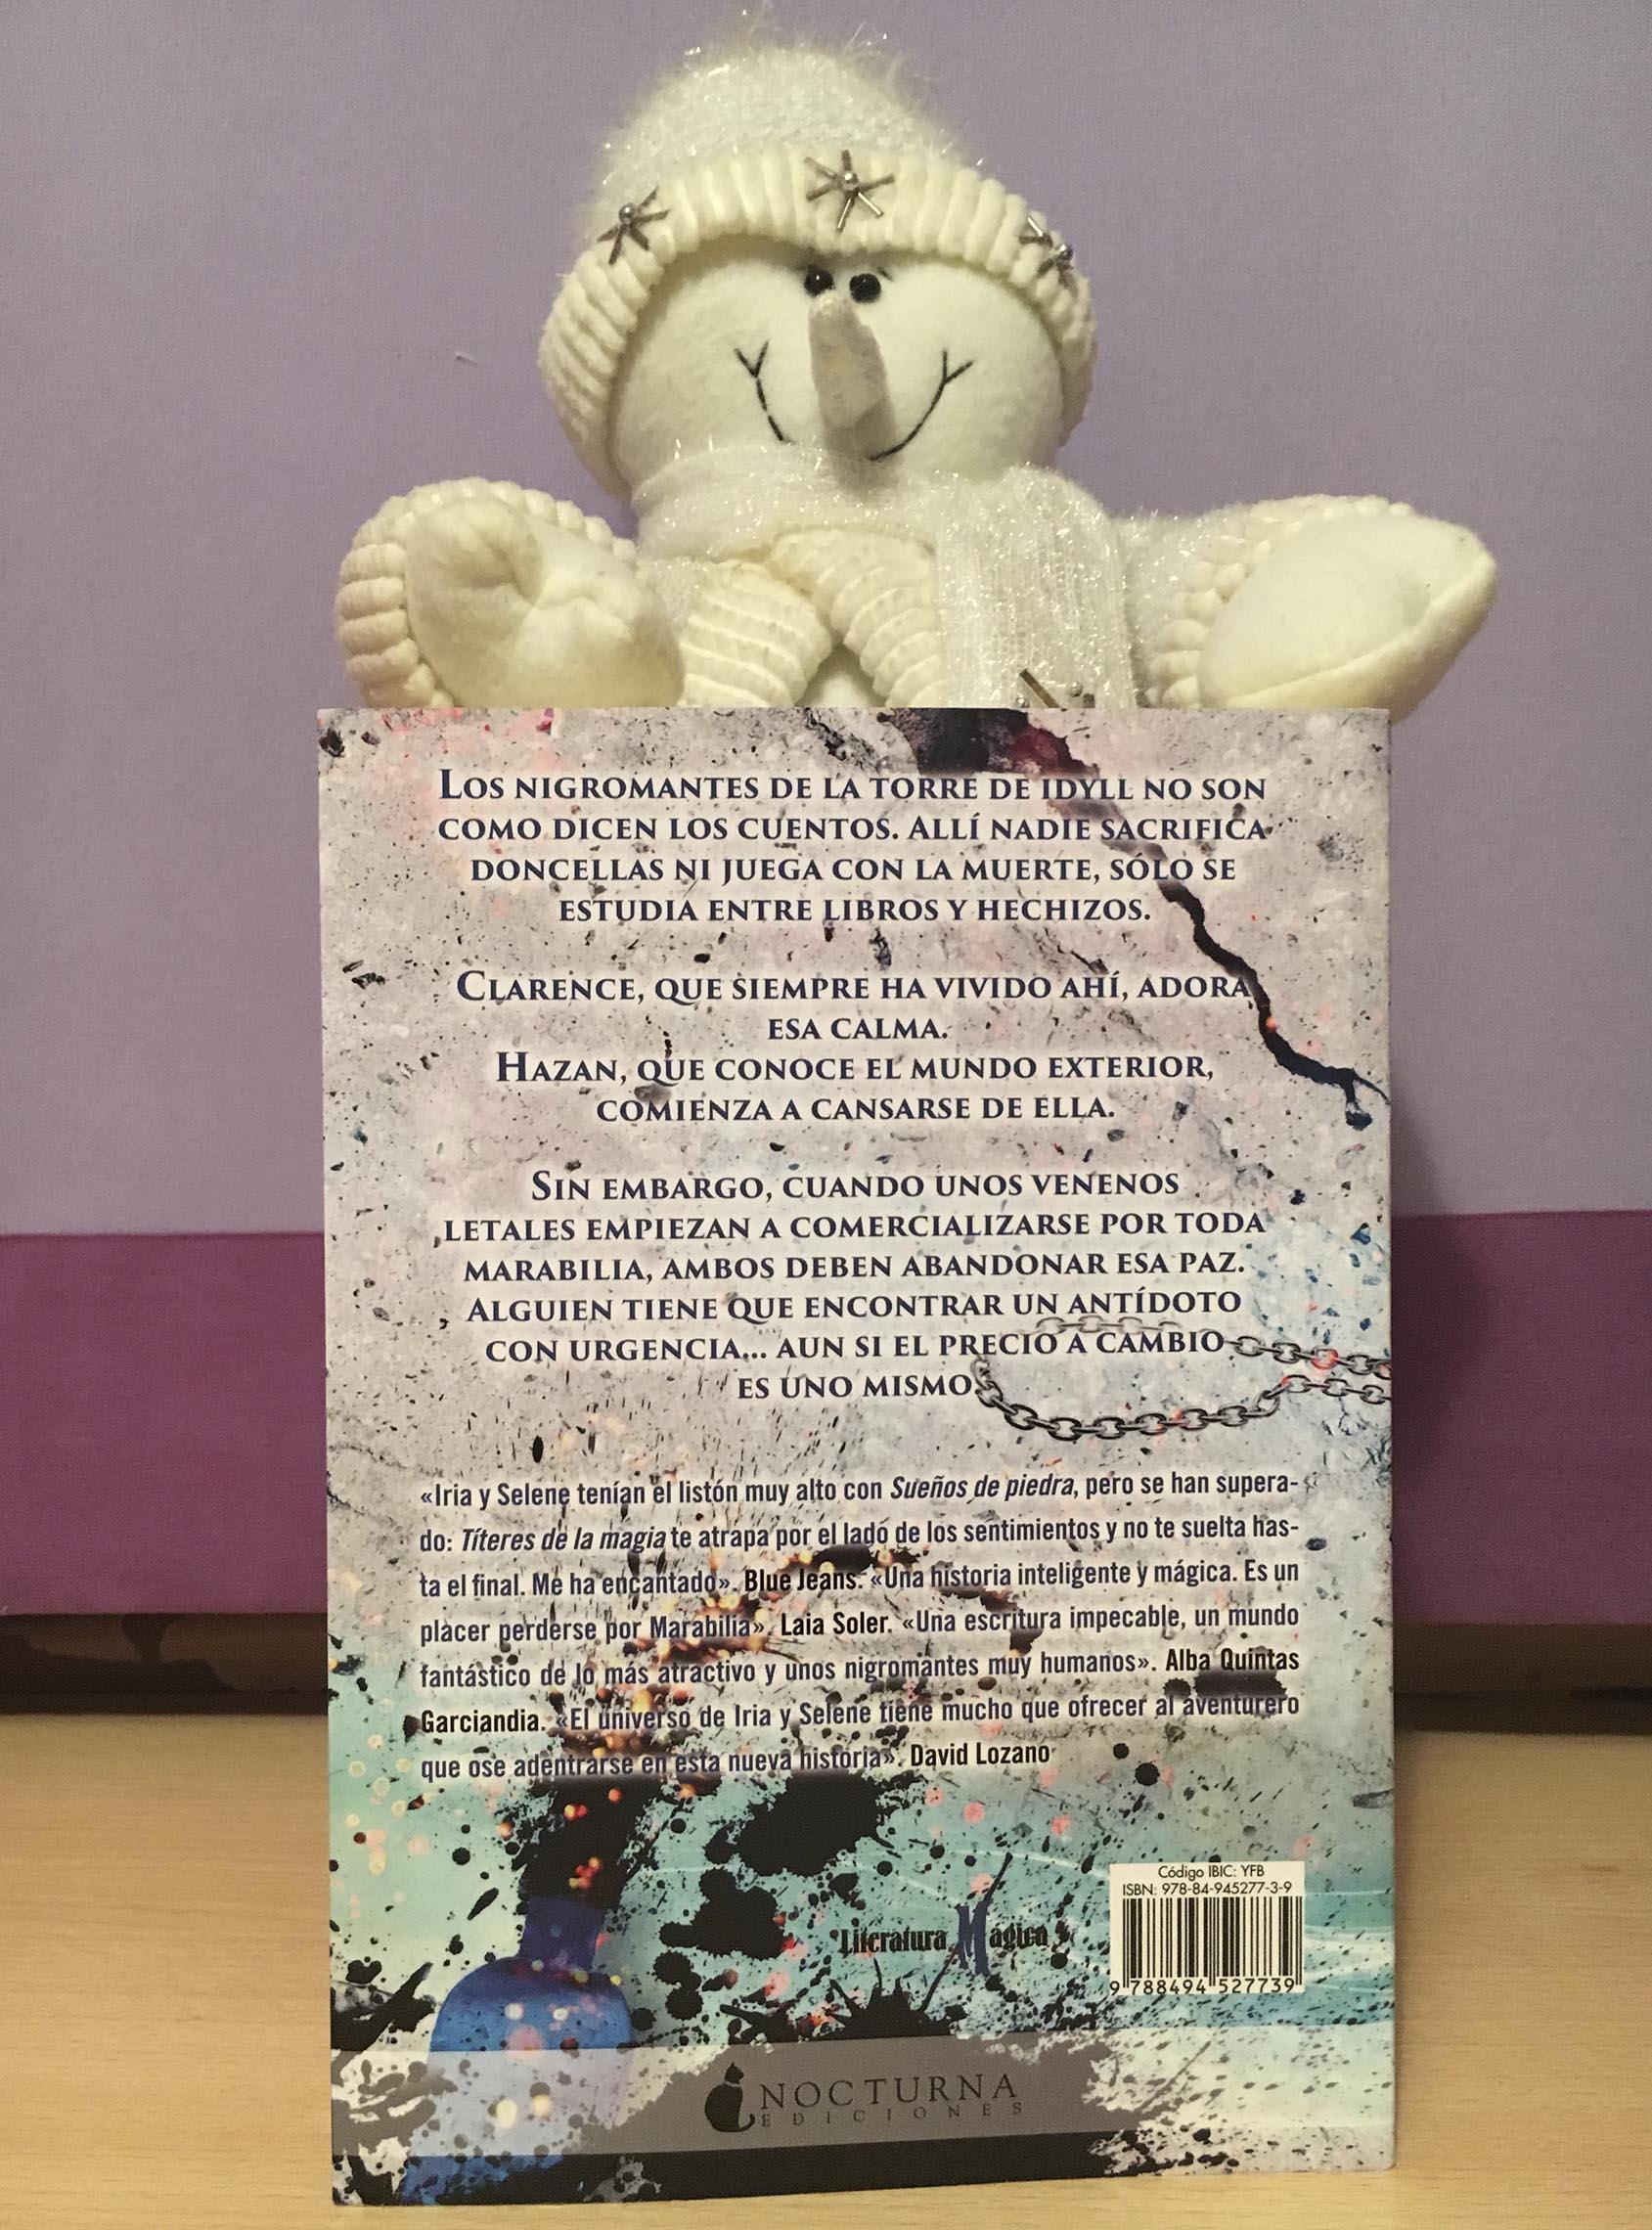 Títeres de la magia, de Iria G. Parente y Selene M. Pascual - Reseña